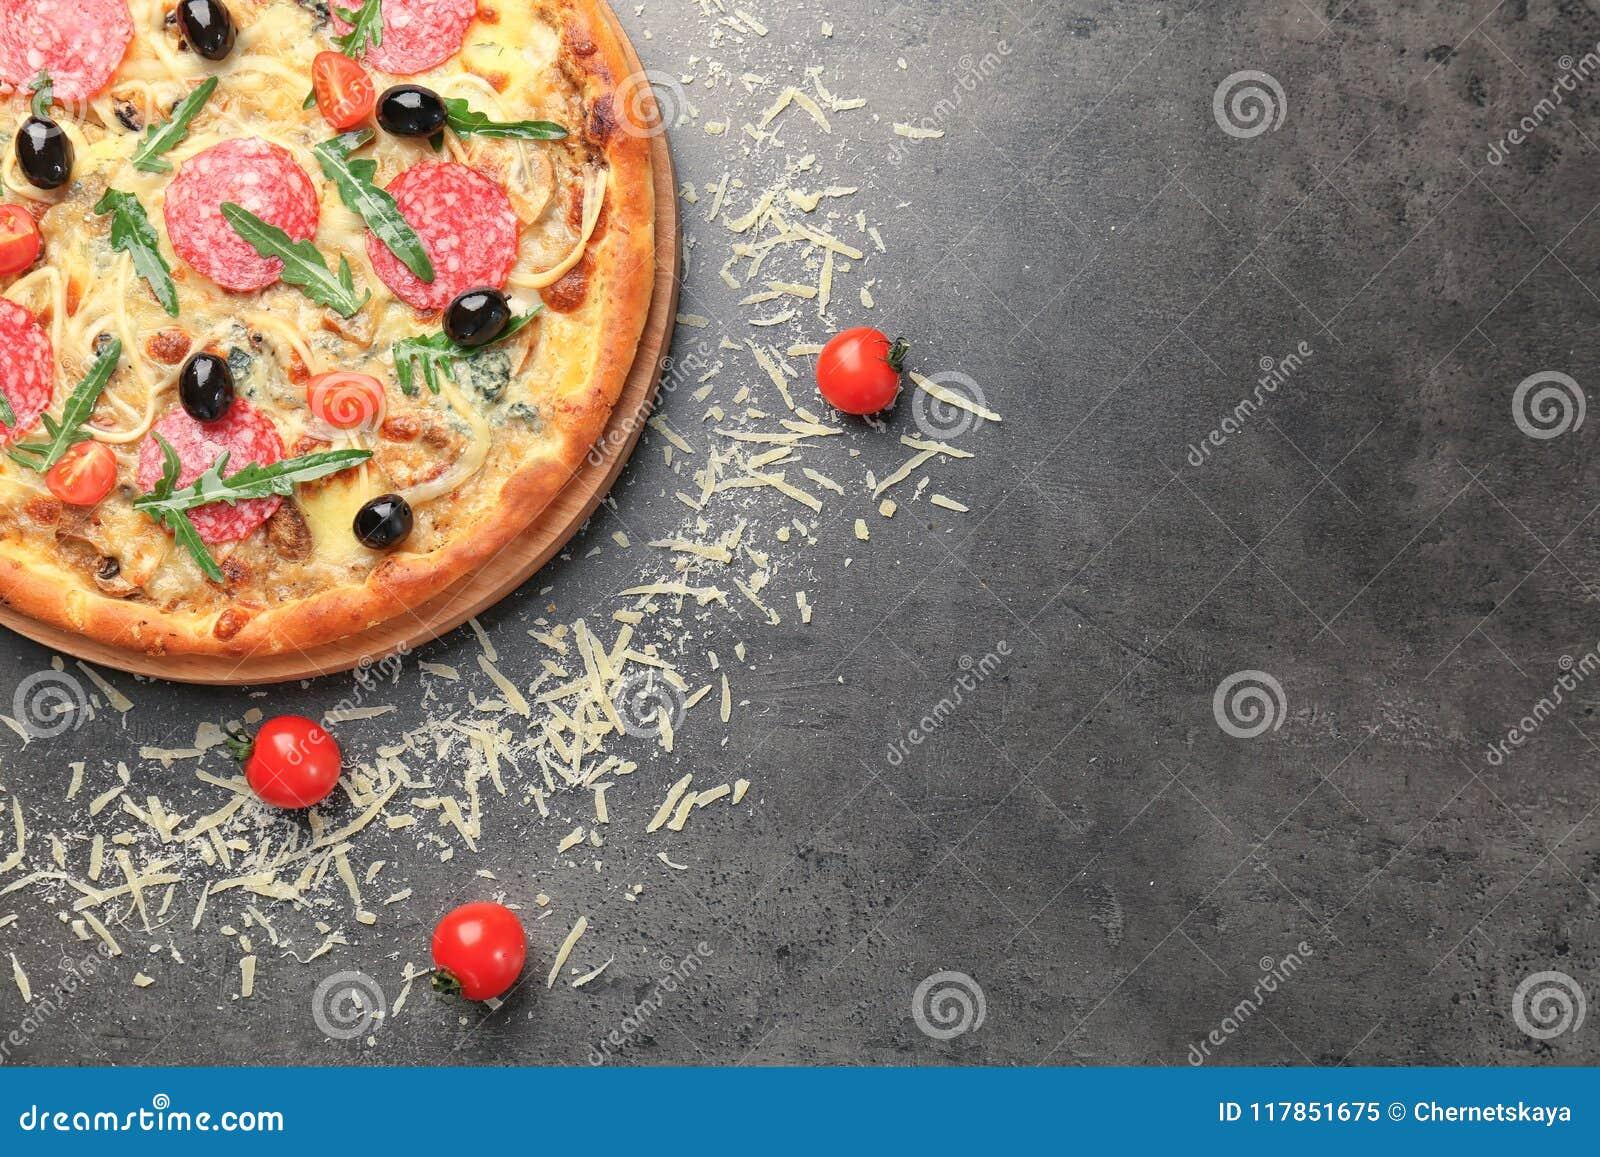 Delicious pizza with tomatoe